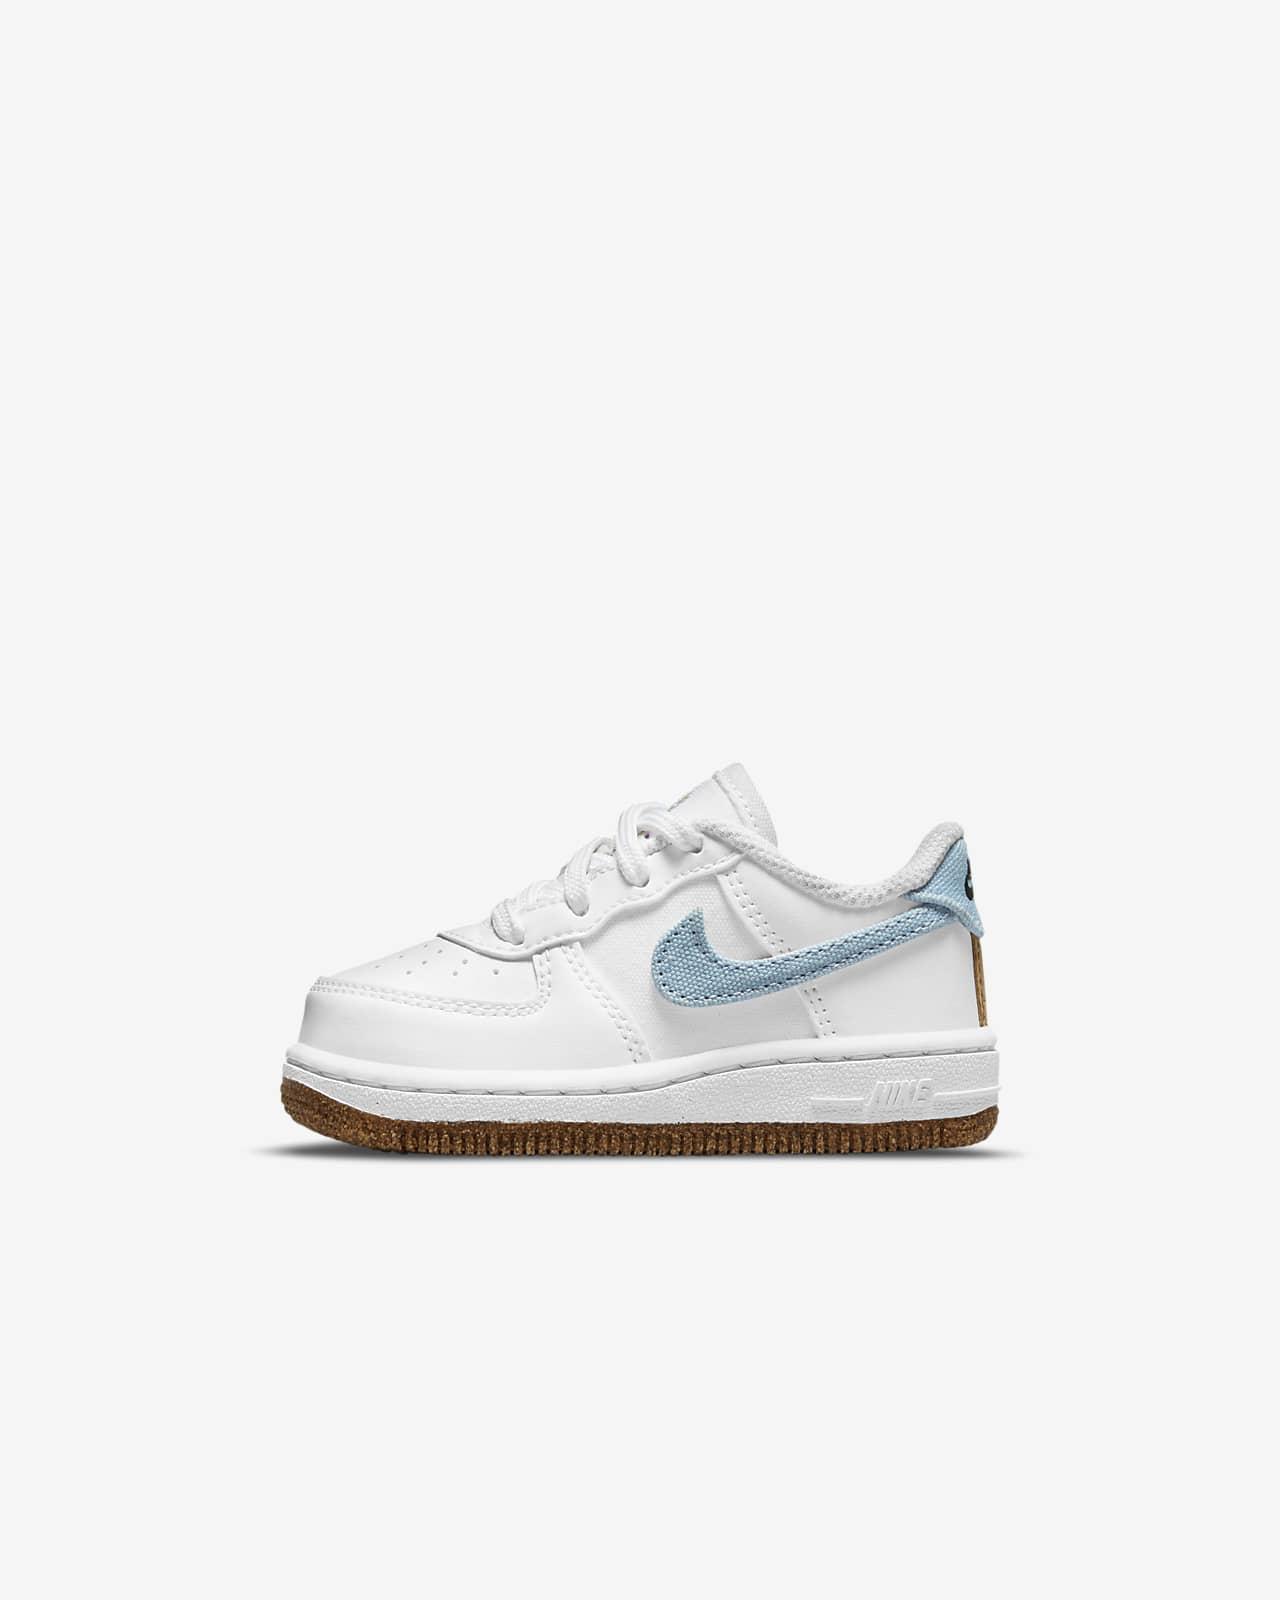 Scarpa Nike Force 1 LV8 - Neonati/Bimbi piccoli